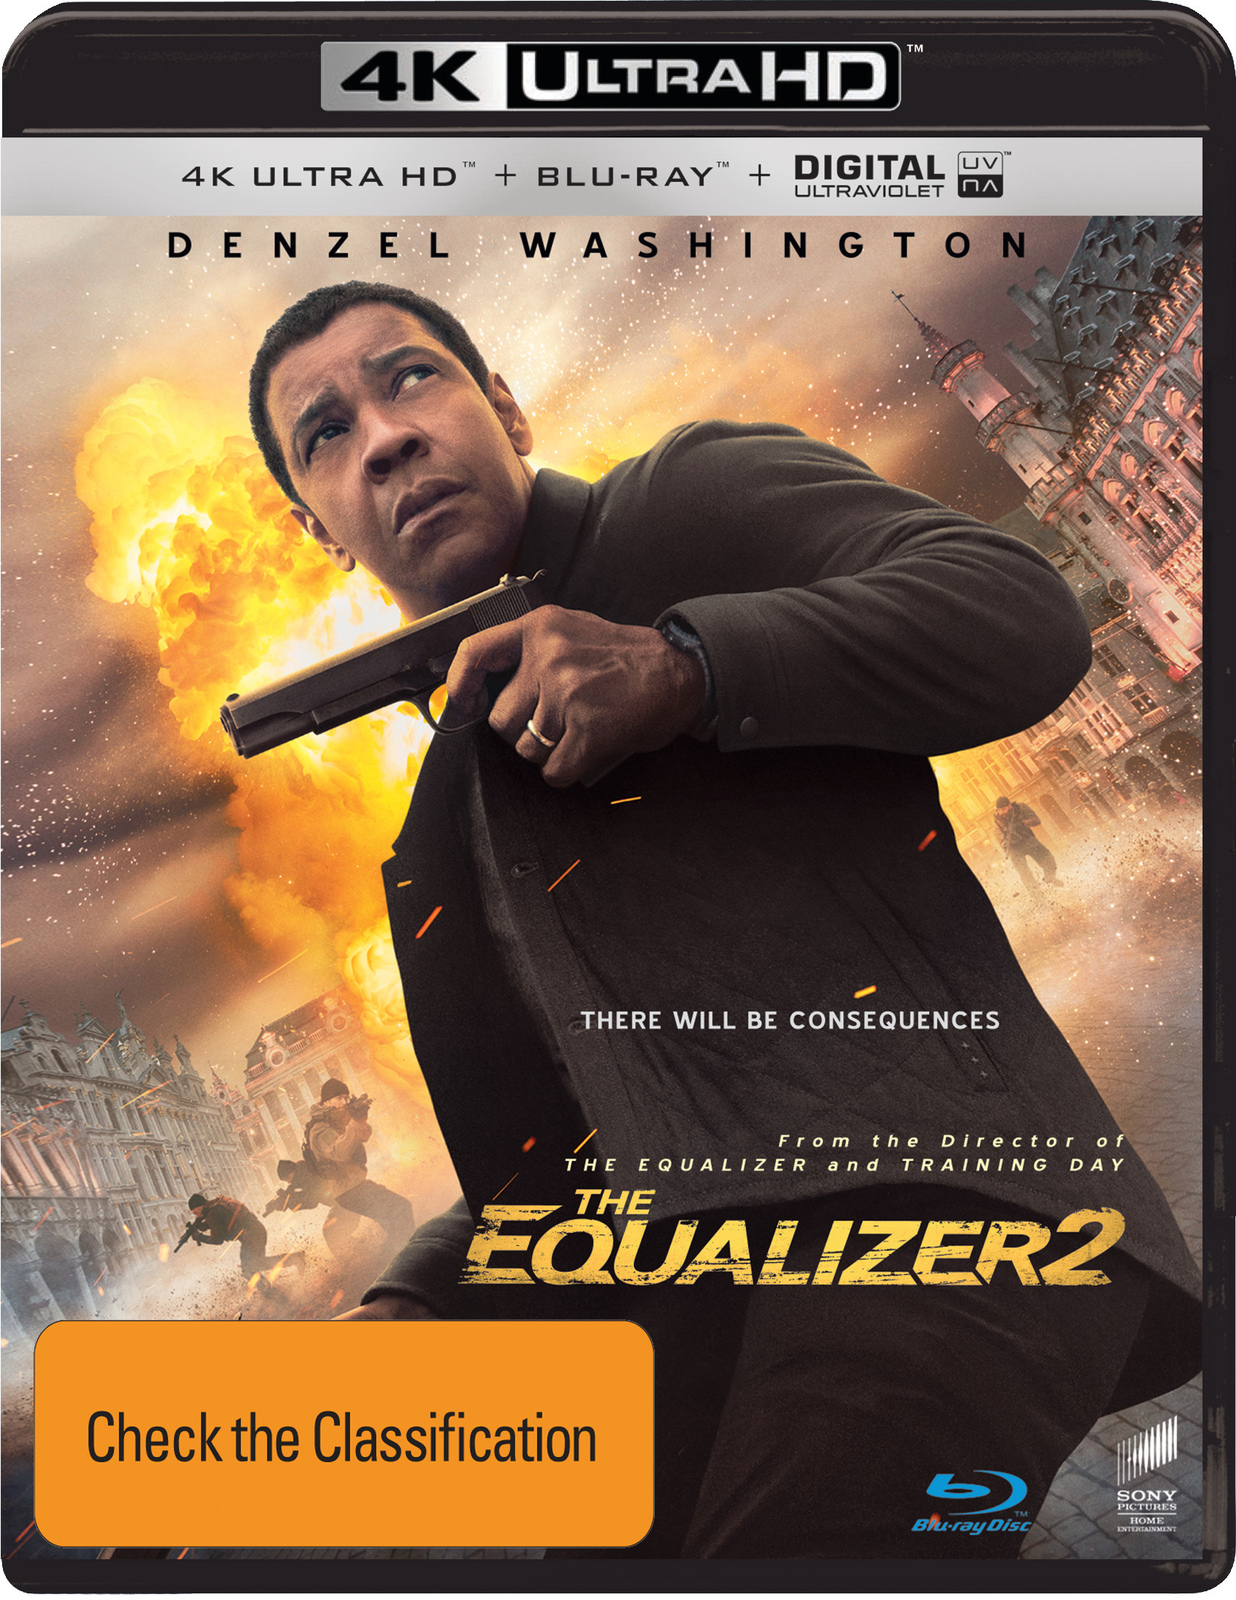 The Equalizer 2 on Blu-ray, UHD Blu-ray image